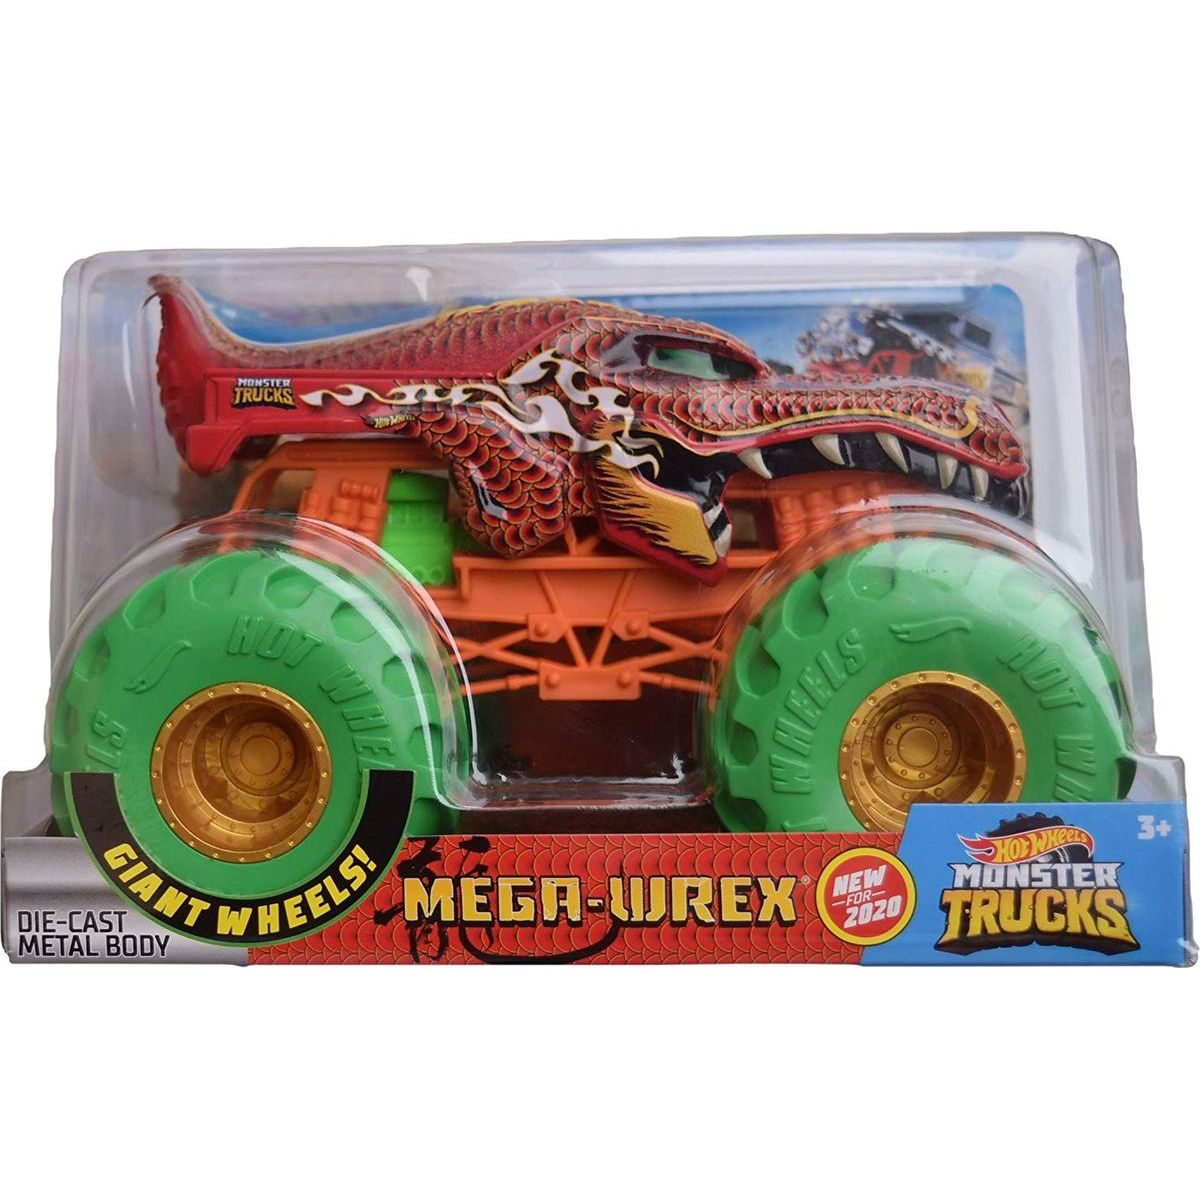 Hot Wheels Monster trucks veľký truck Mega-Wrex oranžovo-zelený